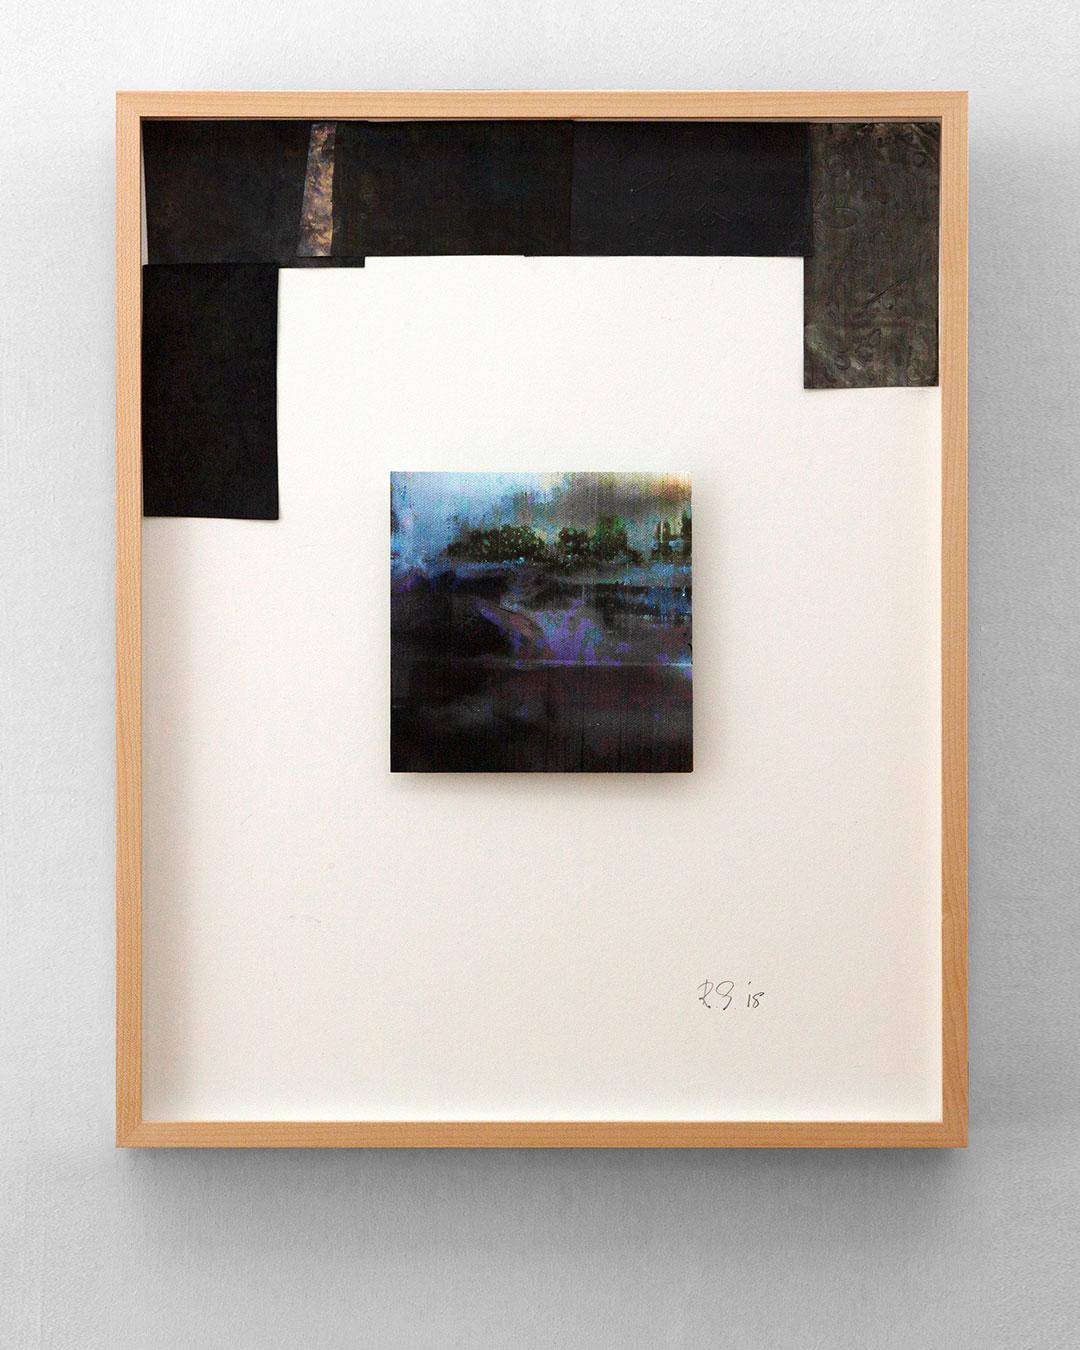 Robert Smit, Framed Sketch for Necklace, 2018, sketch; lead, ink on canvas, 400 x 500 mm, €5400